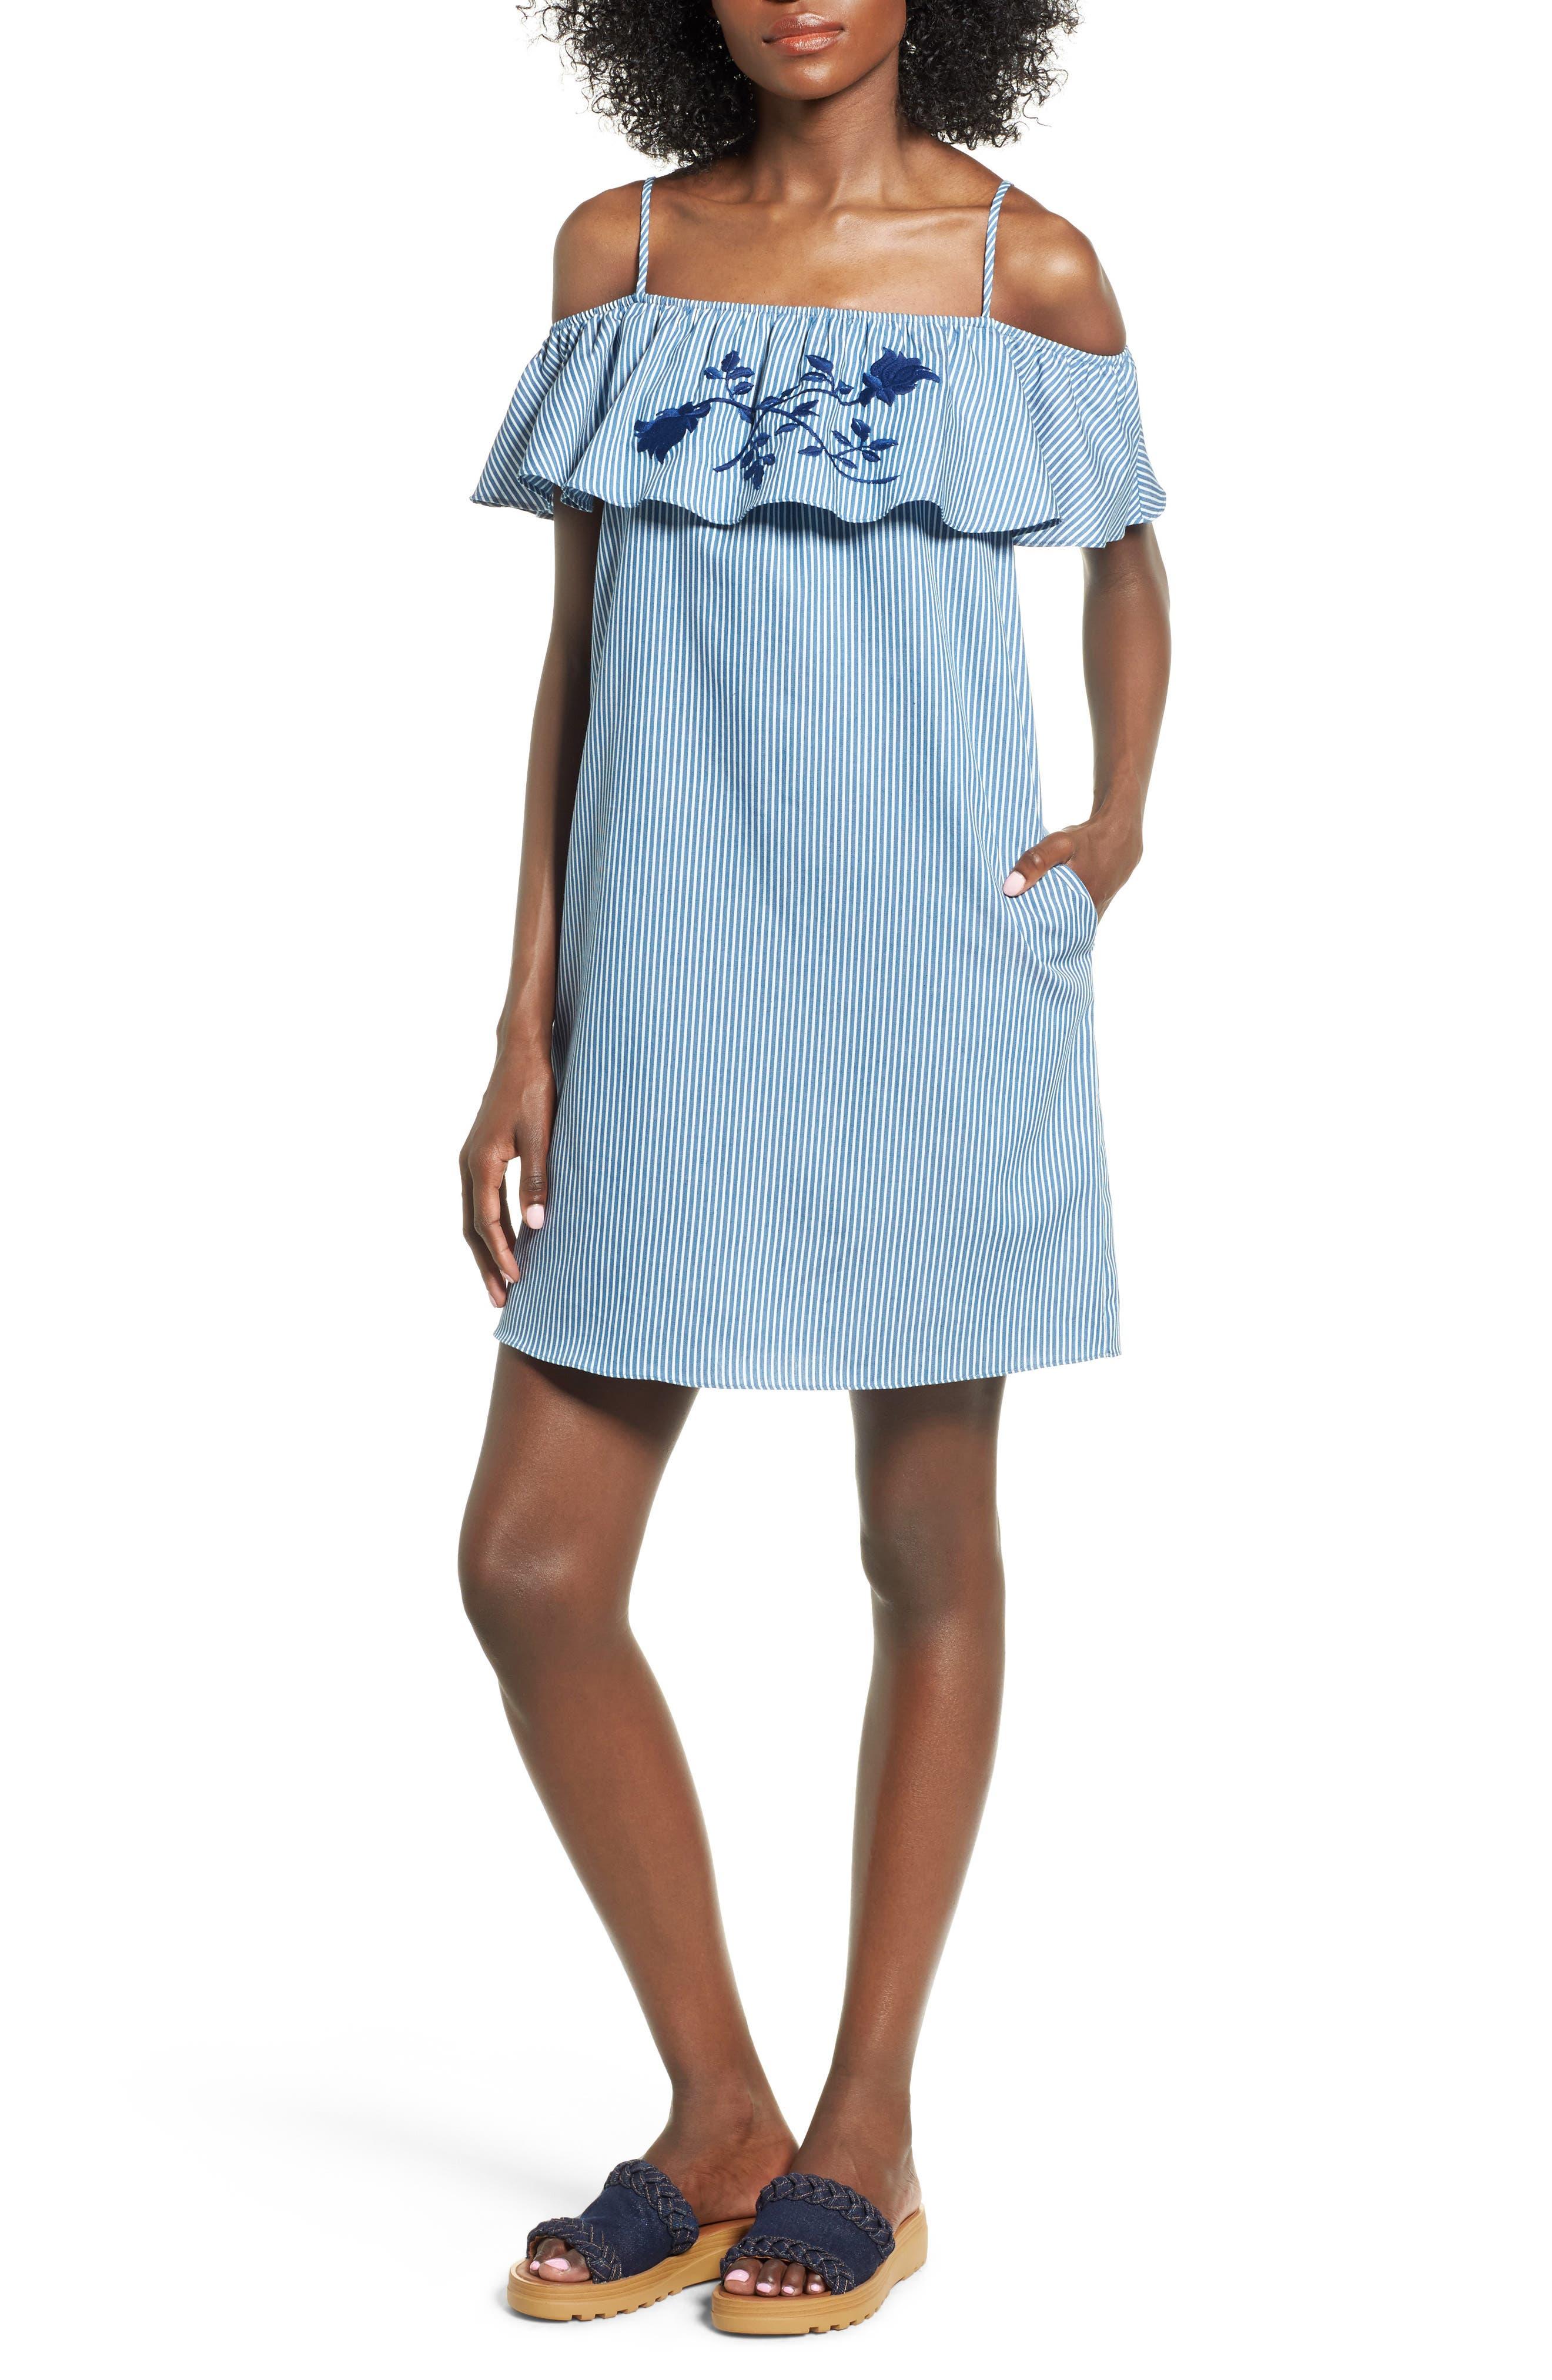 Everly Embroidered Cold Shoulder Dress